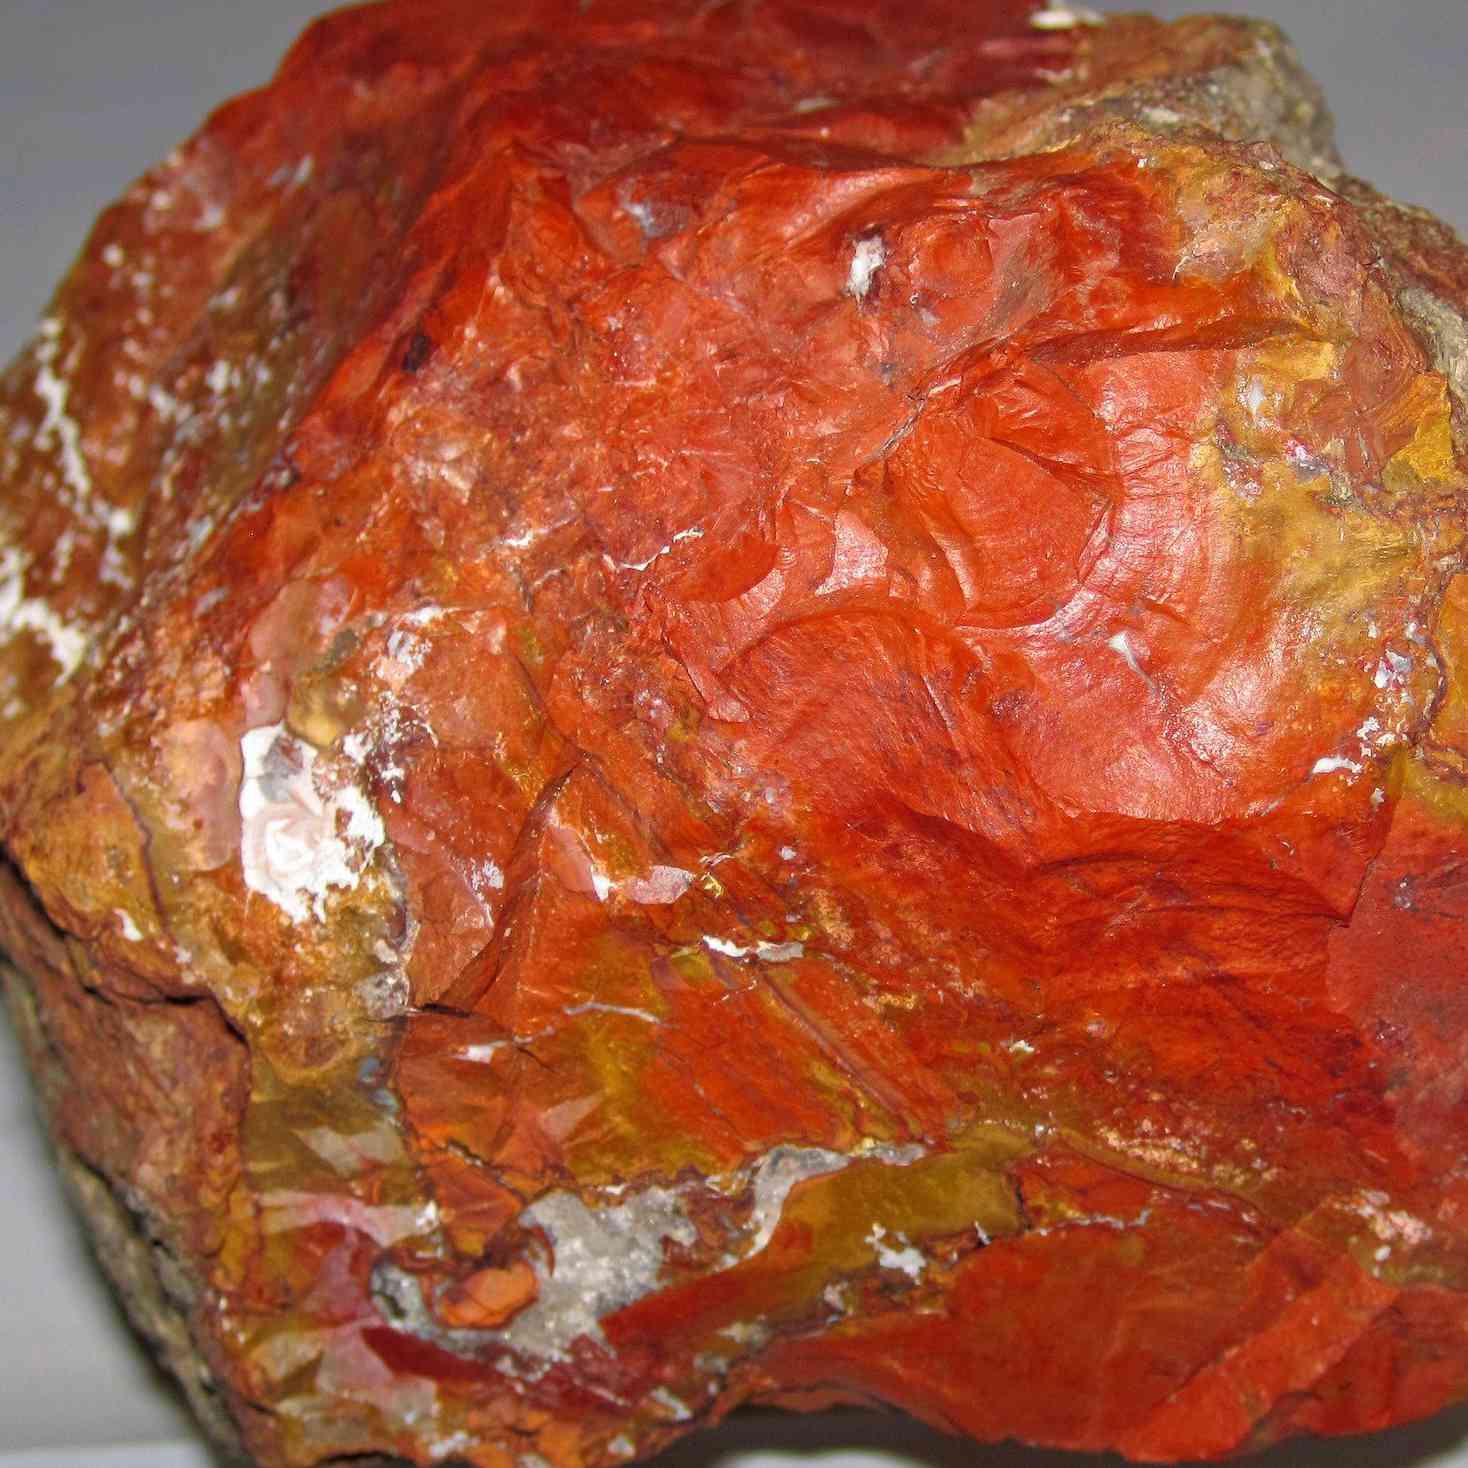 Gallery of Chert Rocks and Gemstones